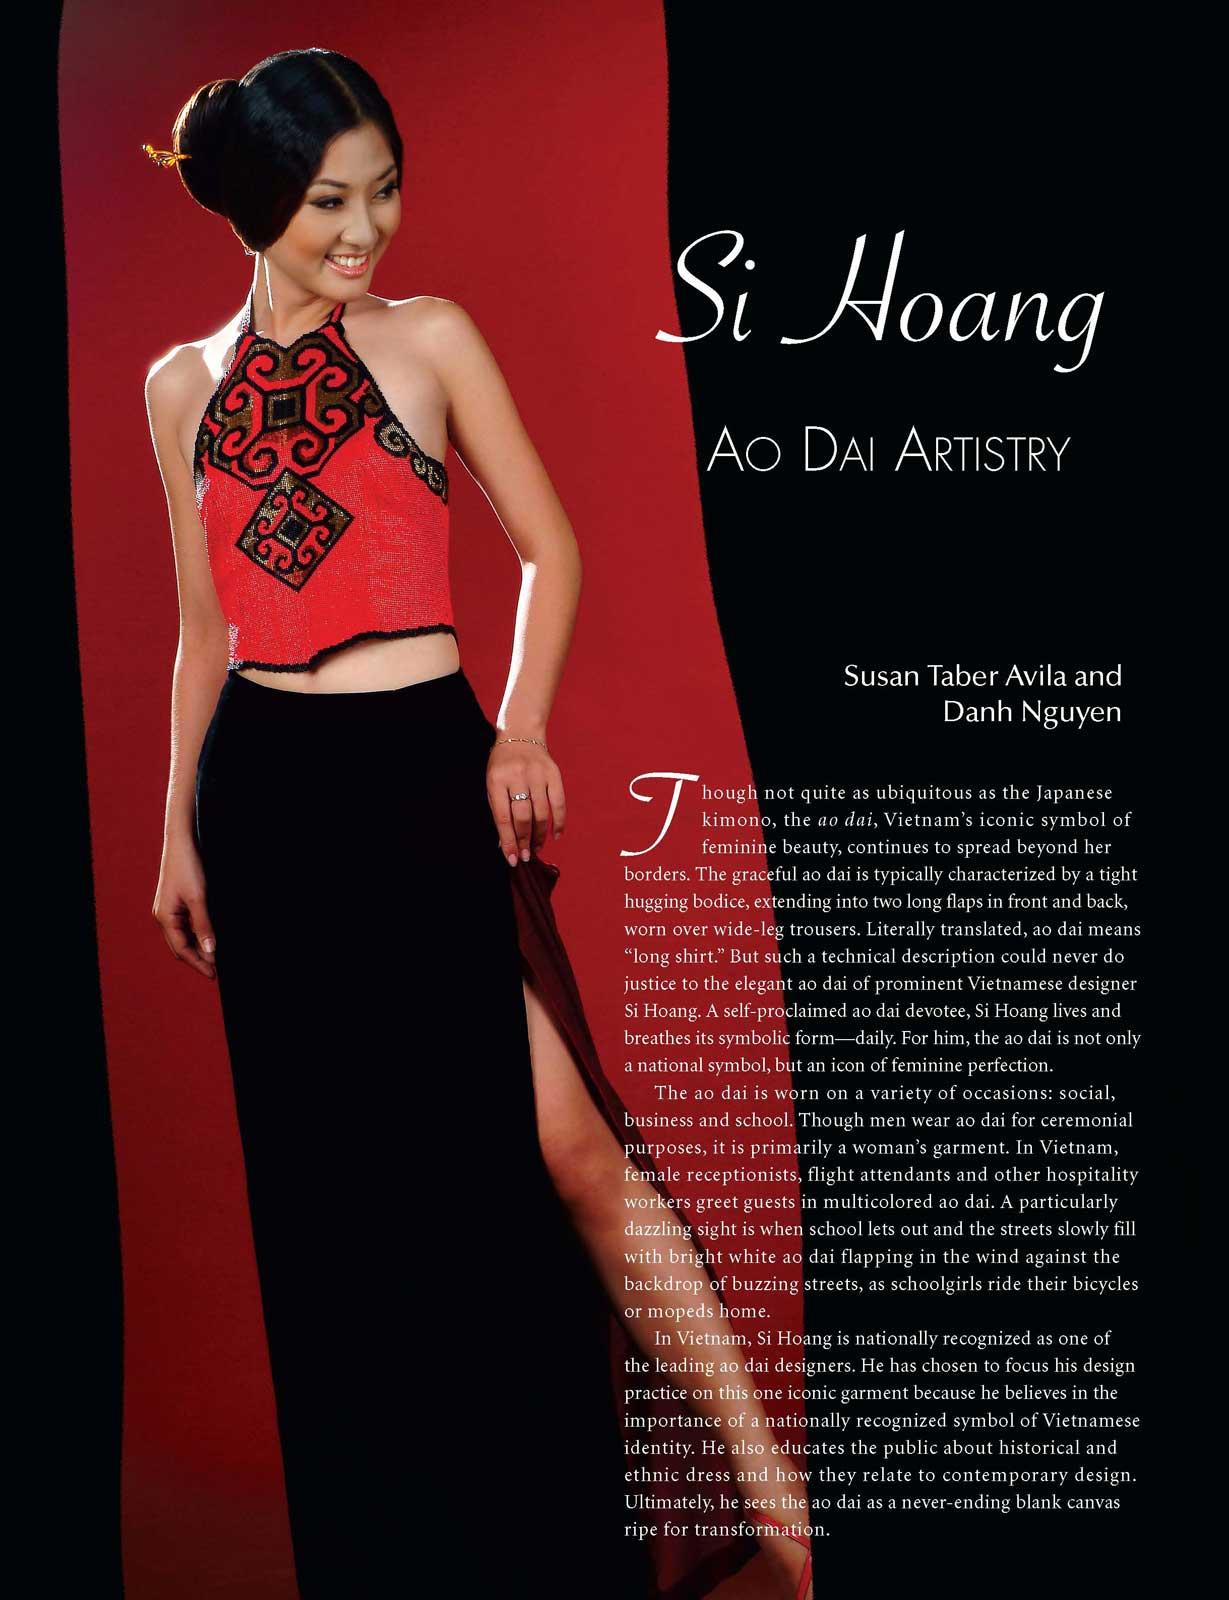 Orn30_4_Si_Hoang_Cover.jpg